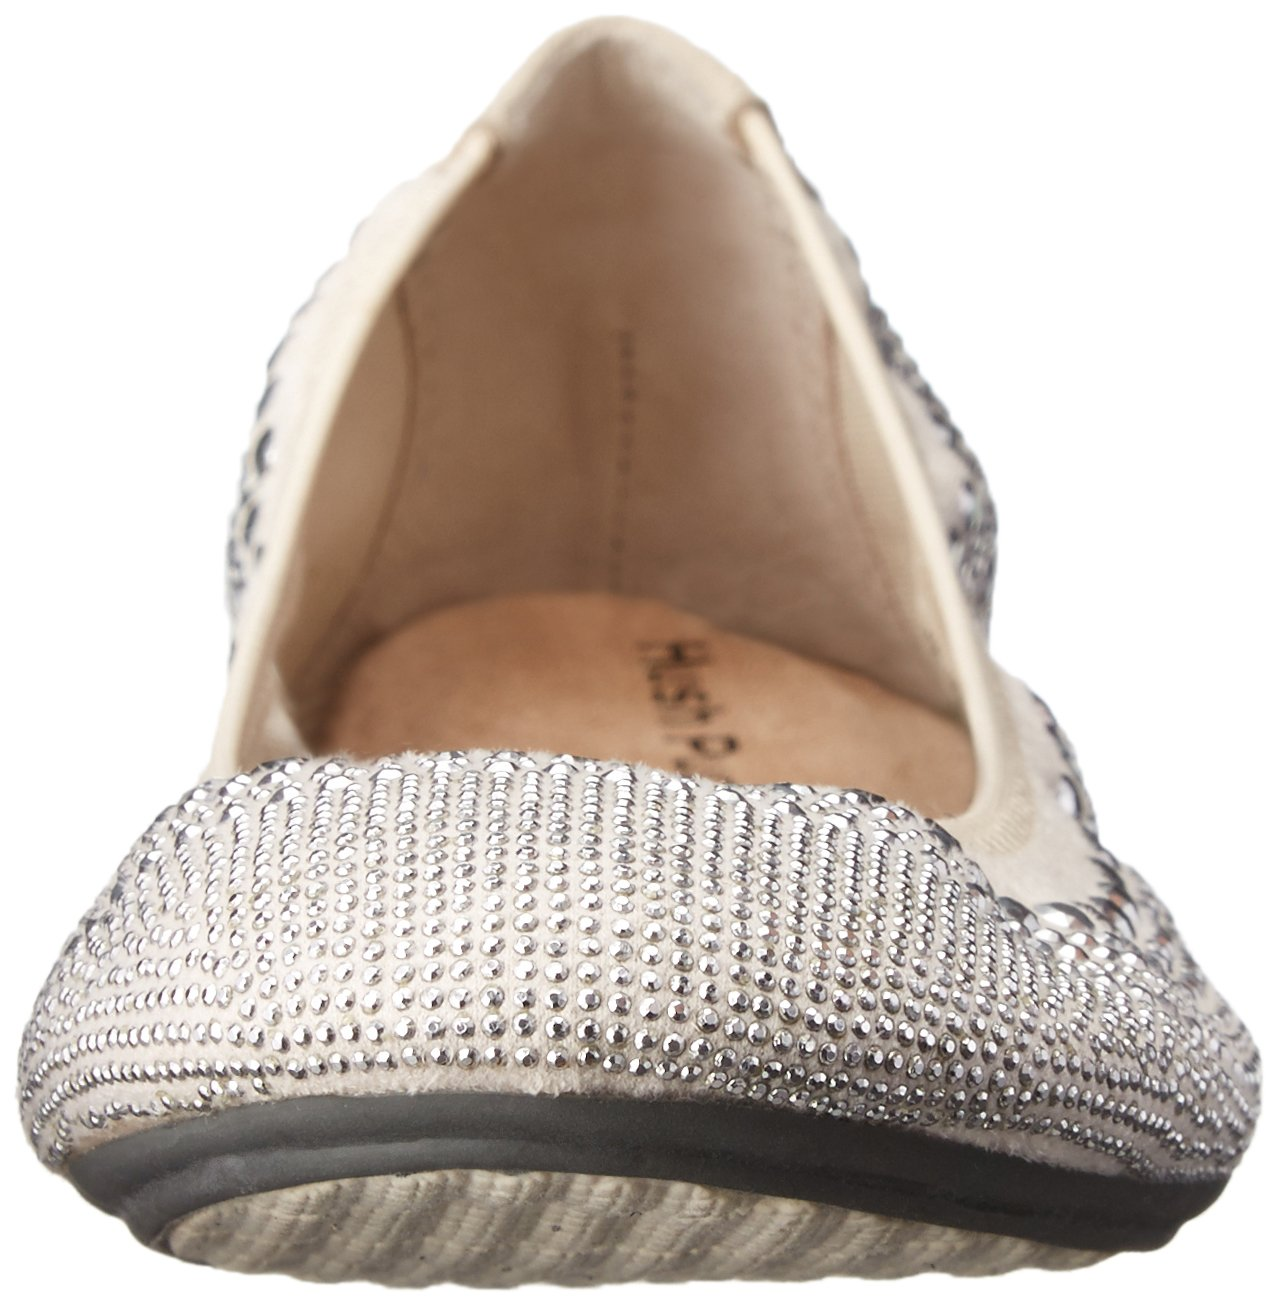 Hush Puppies Women's Chaste Ballet Flat Stud B00HS4ETVM 8.5 N US|Silver Stud Flat aaf0be